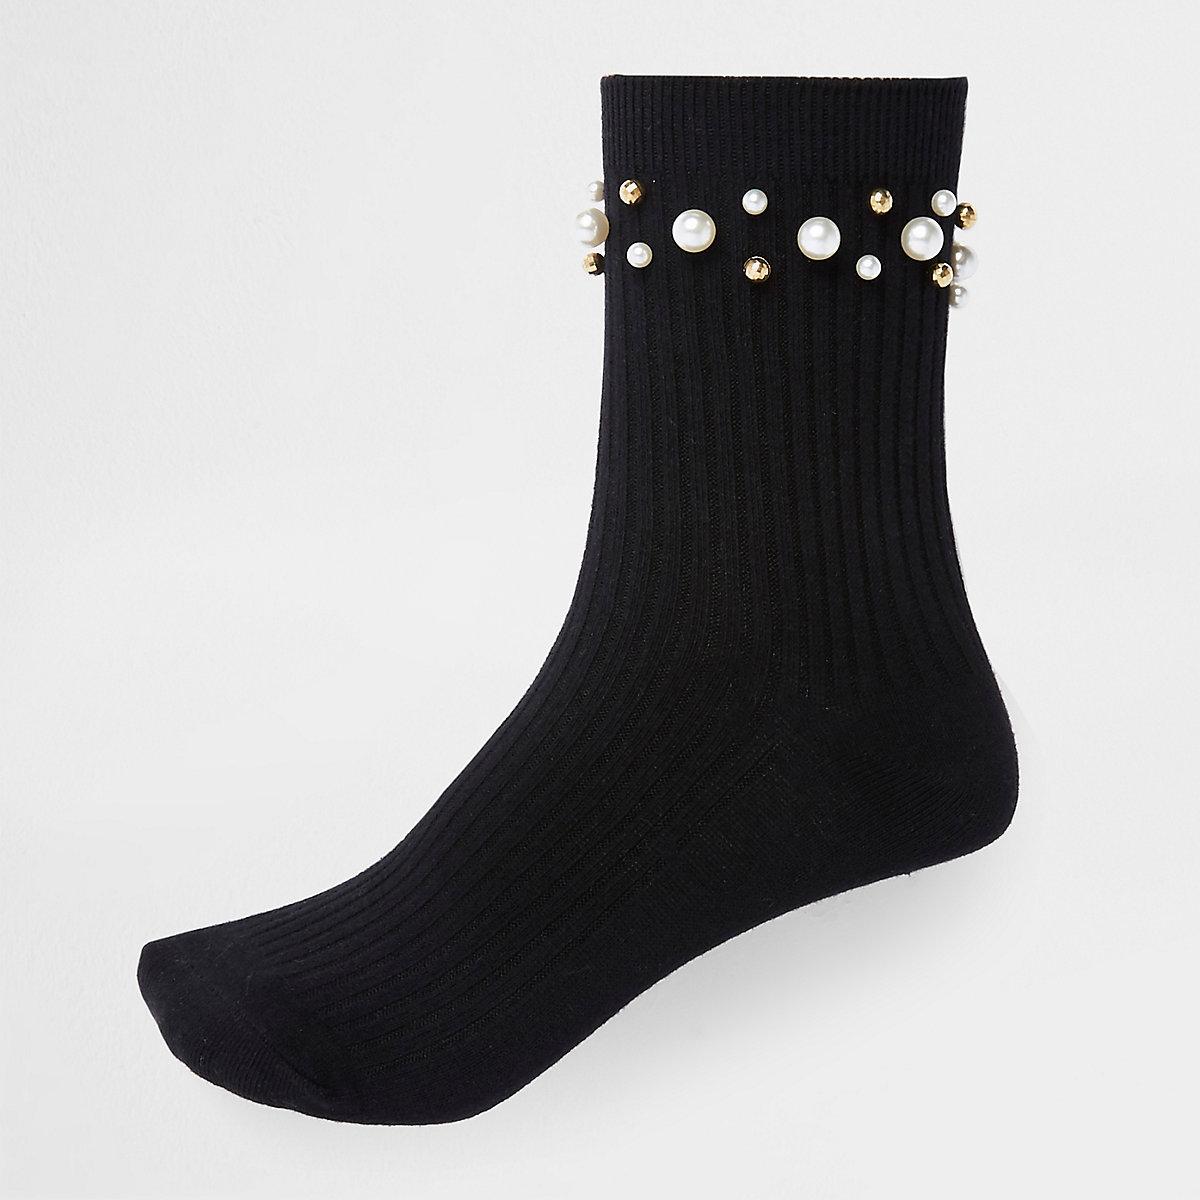 Black pearl trim ankle socks